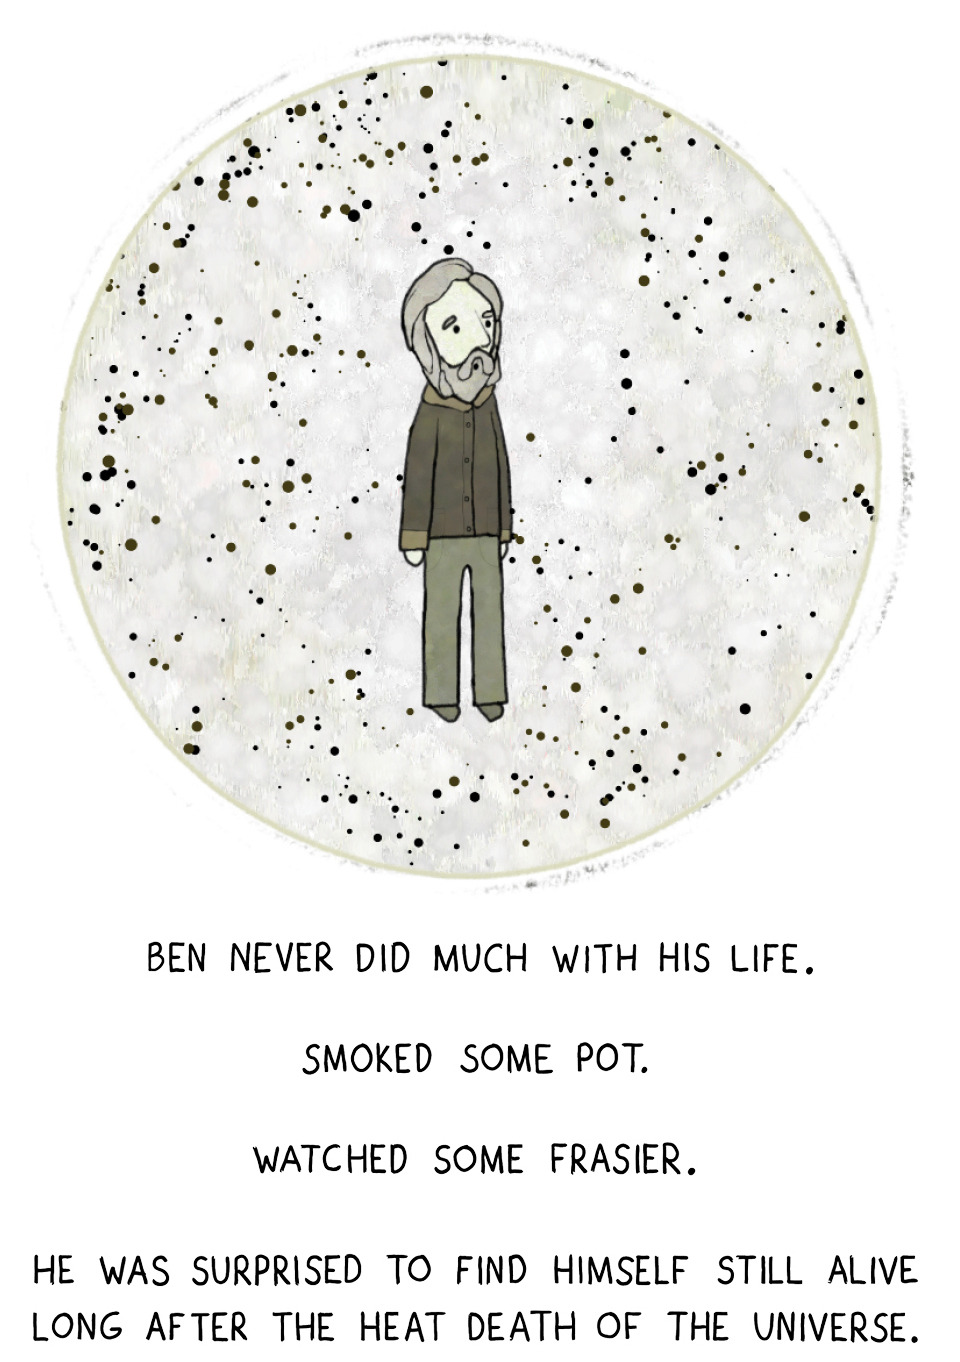 Infinite Immortal Bens  - infiniteimmortalbens.tumblr.com